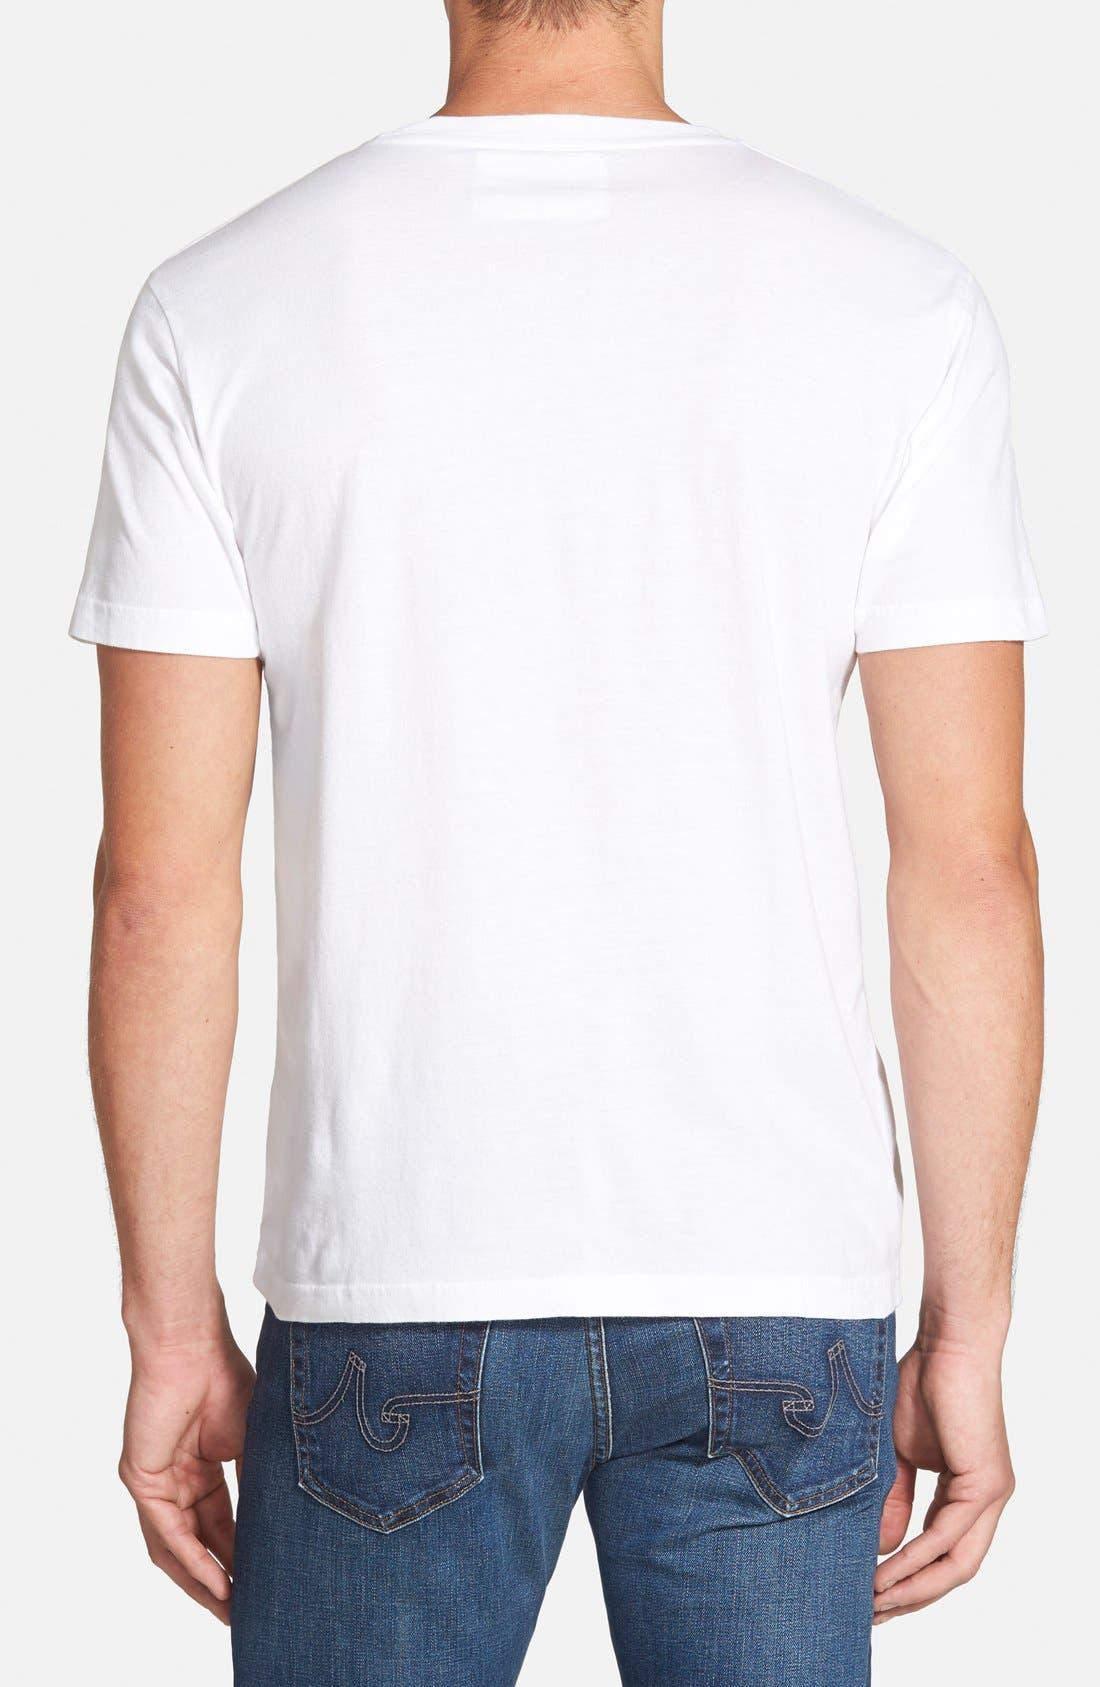 'Caddyshack - Bushwood CC' Graphic T-Shirt,                             Alternate thumbnail 3, color,                             100